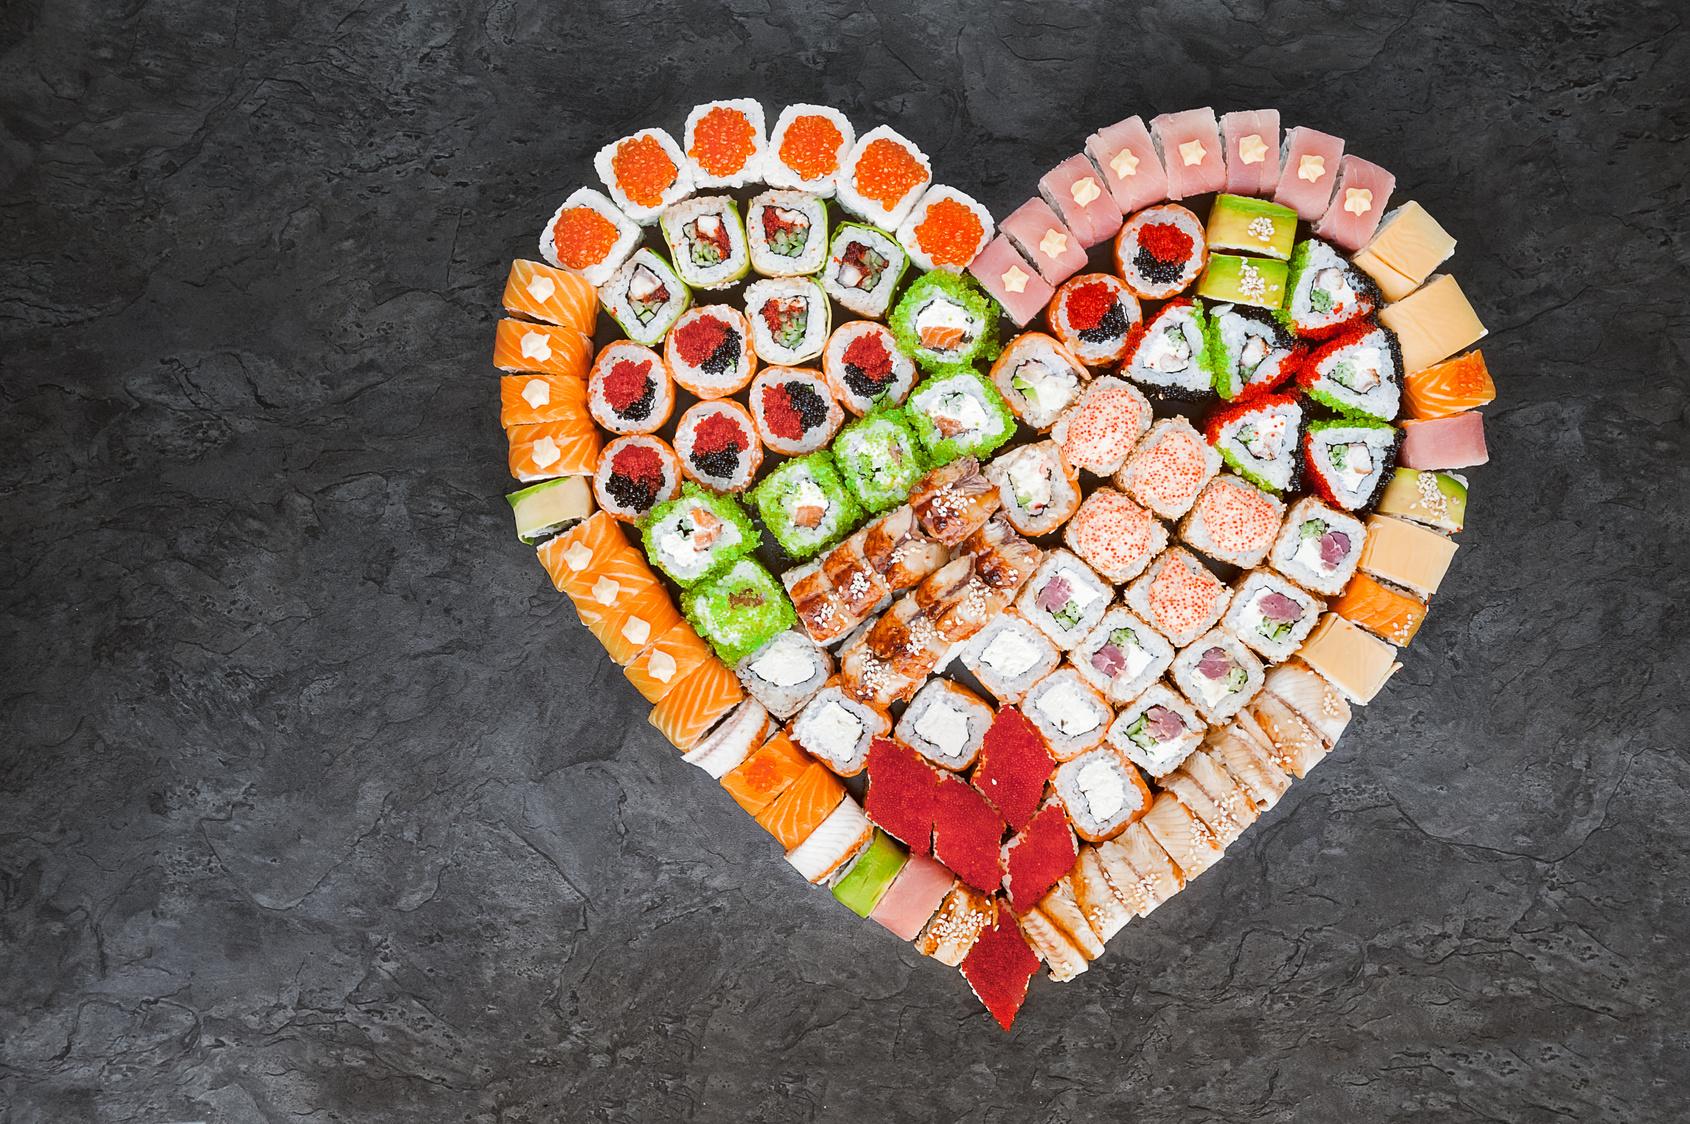 serce zrobione z sushi